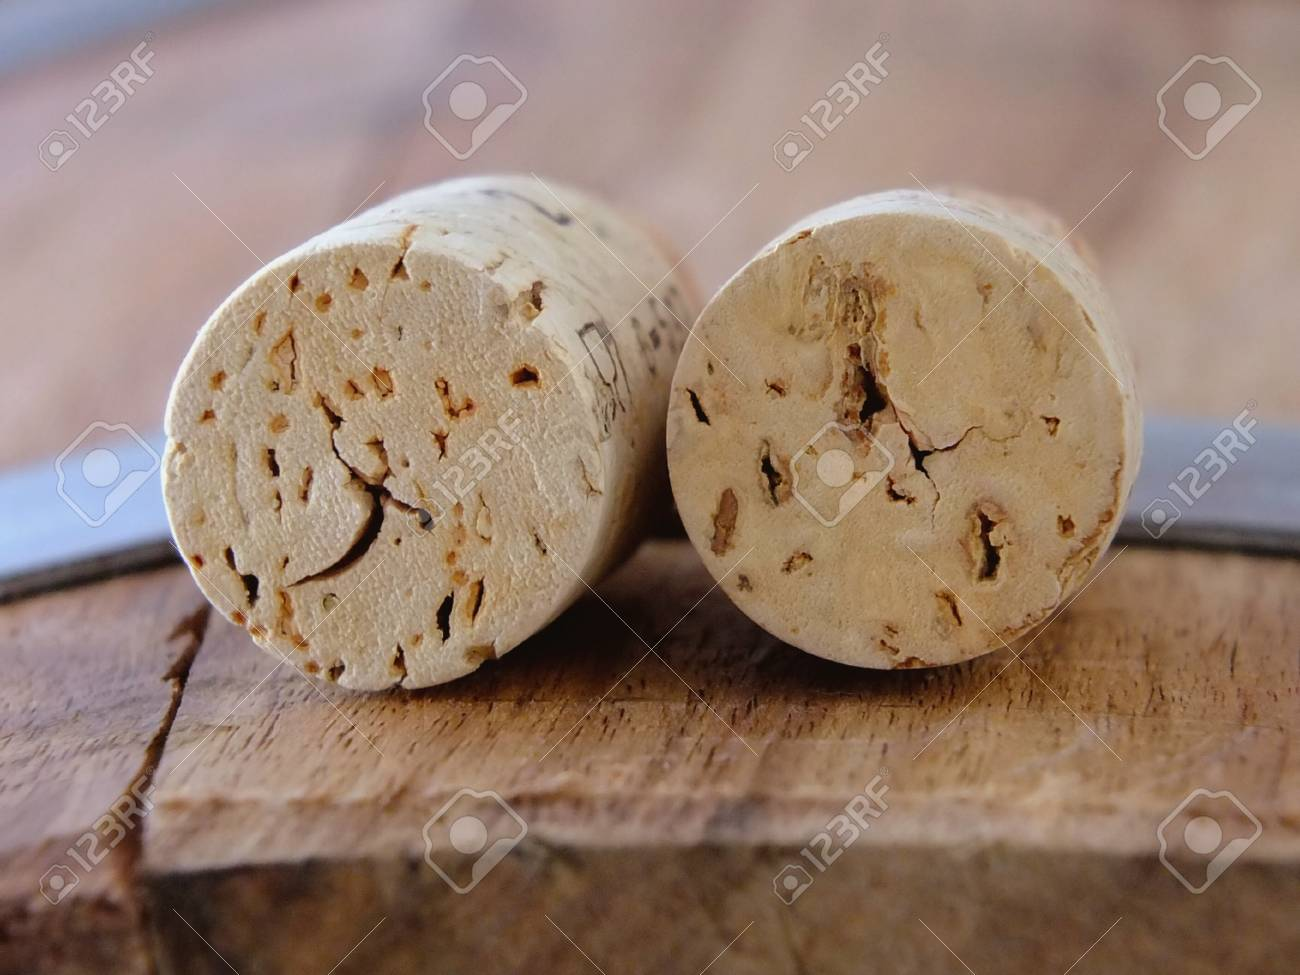 Image of two wine corks Standard-Bild - 48700109